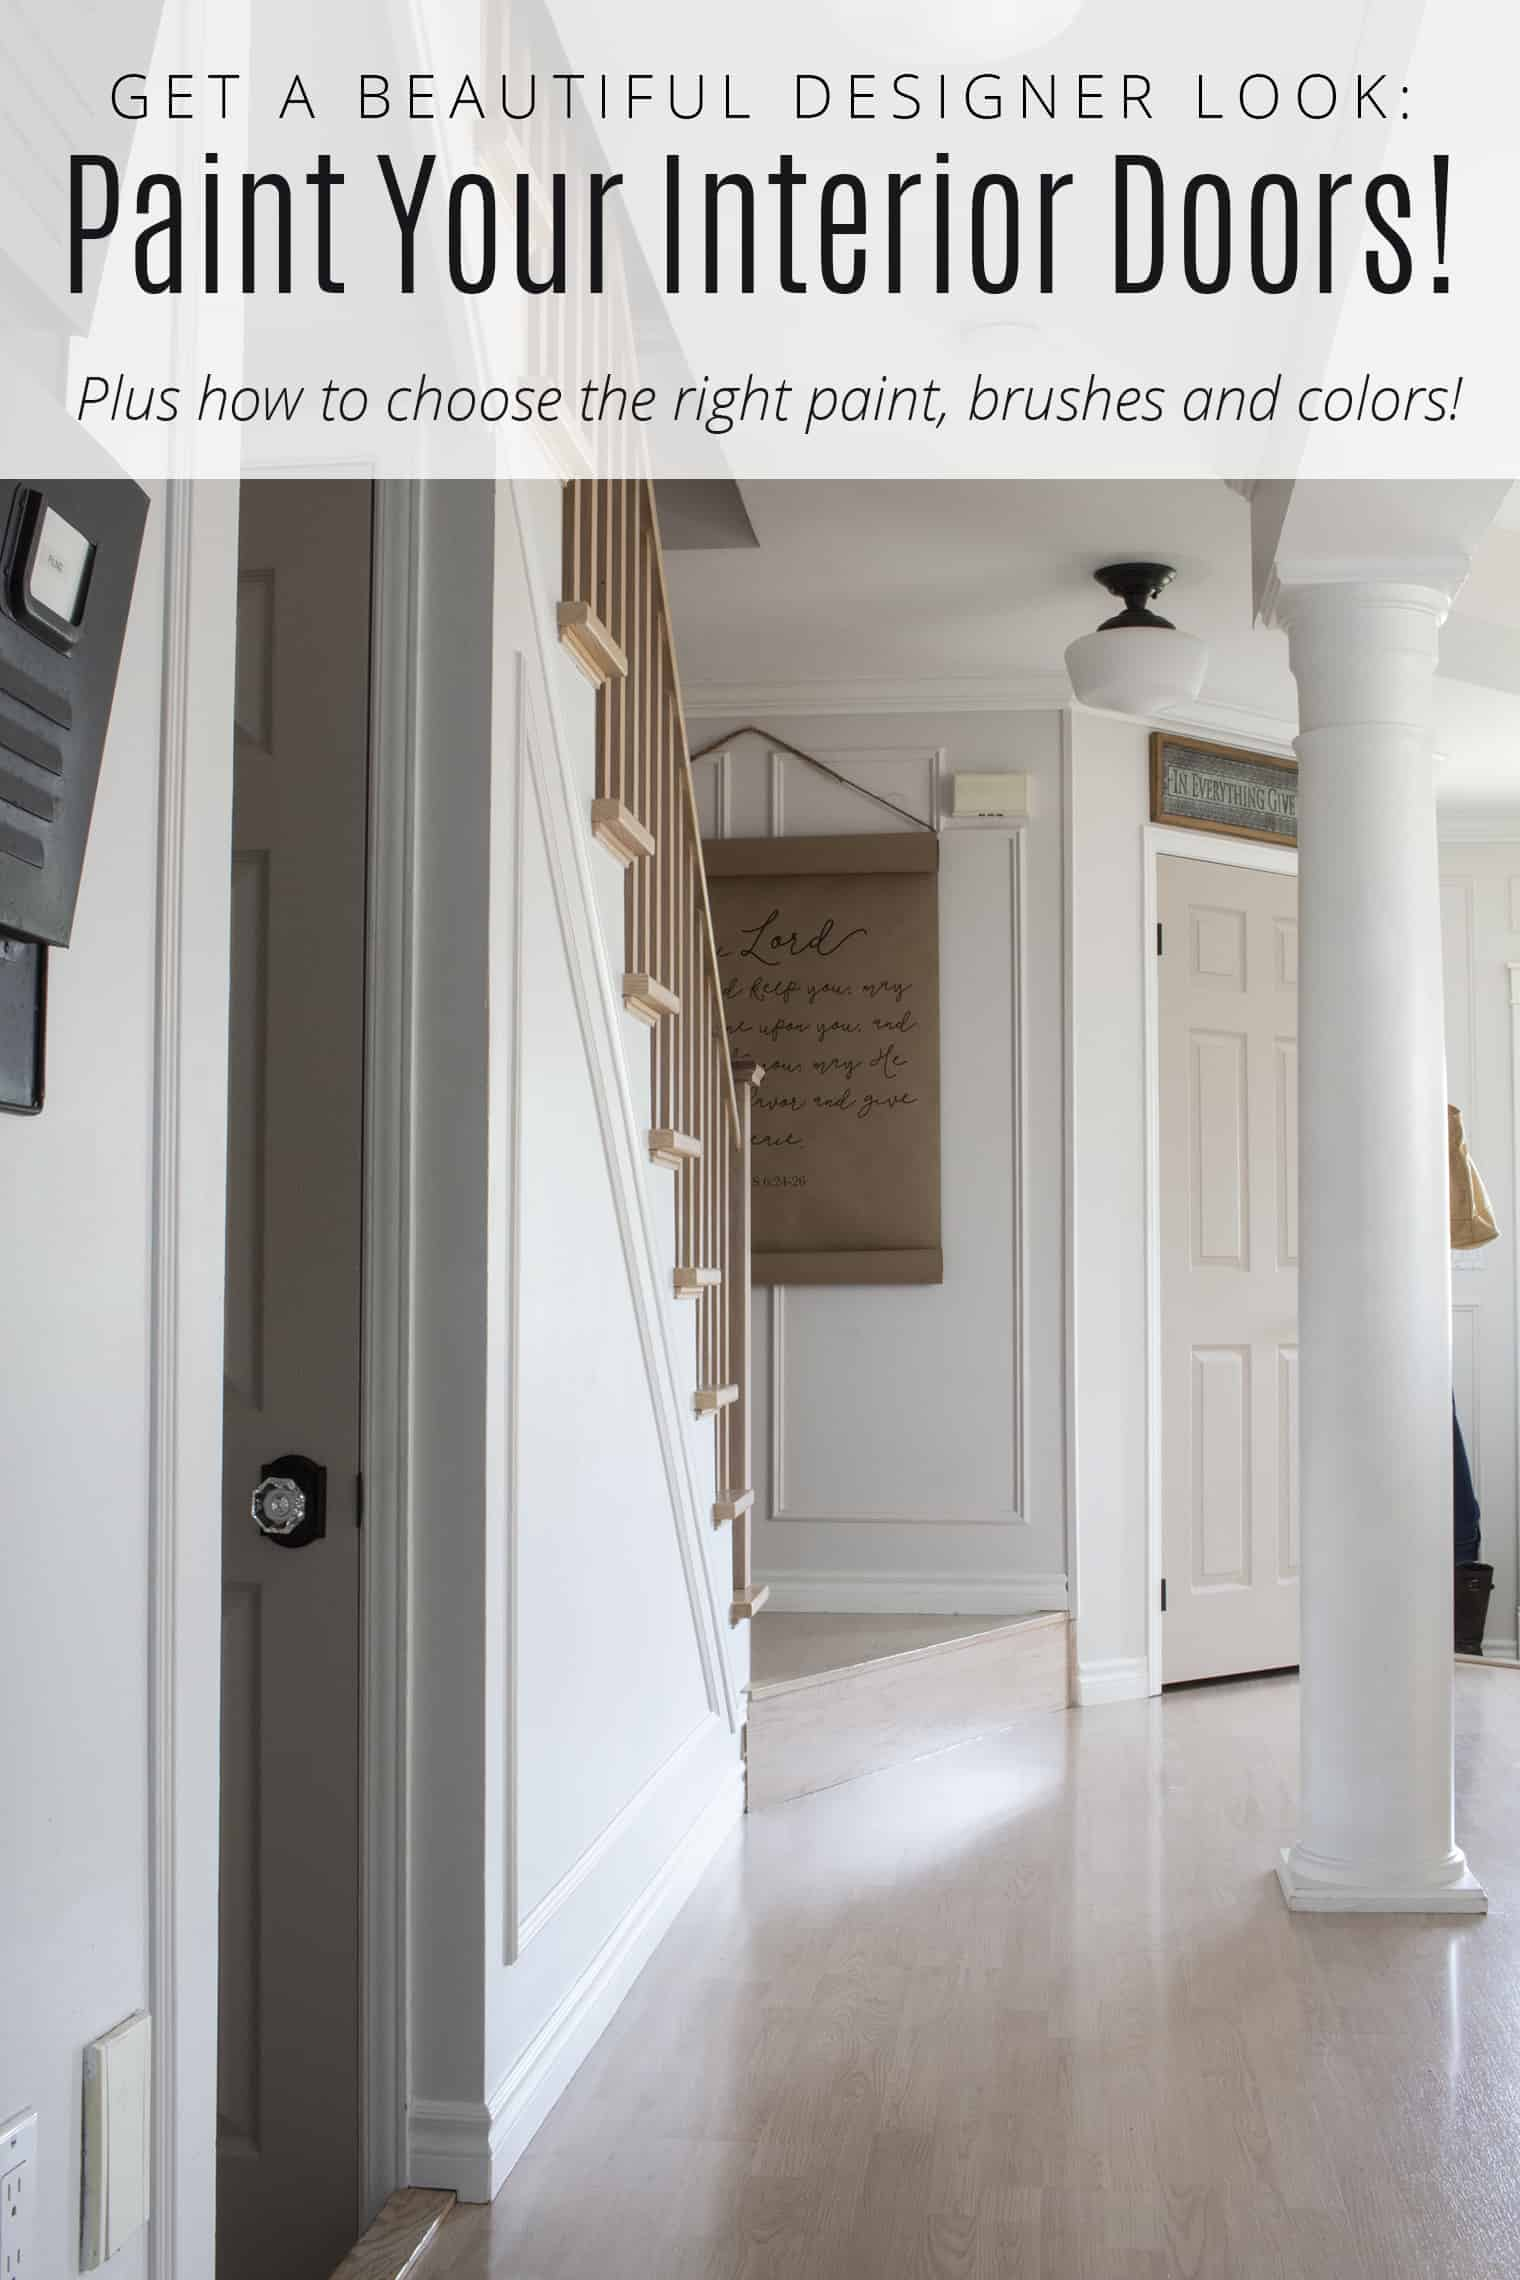 Get A Beautiful Designer Look When You Paint Your Interior Doors